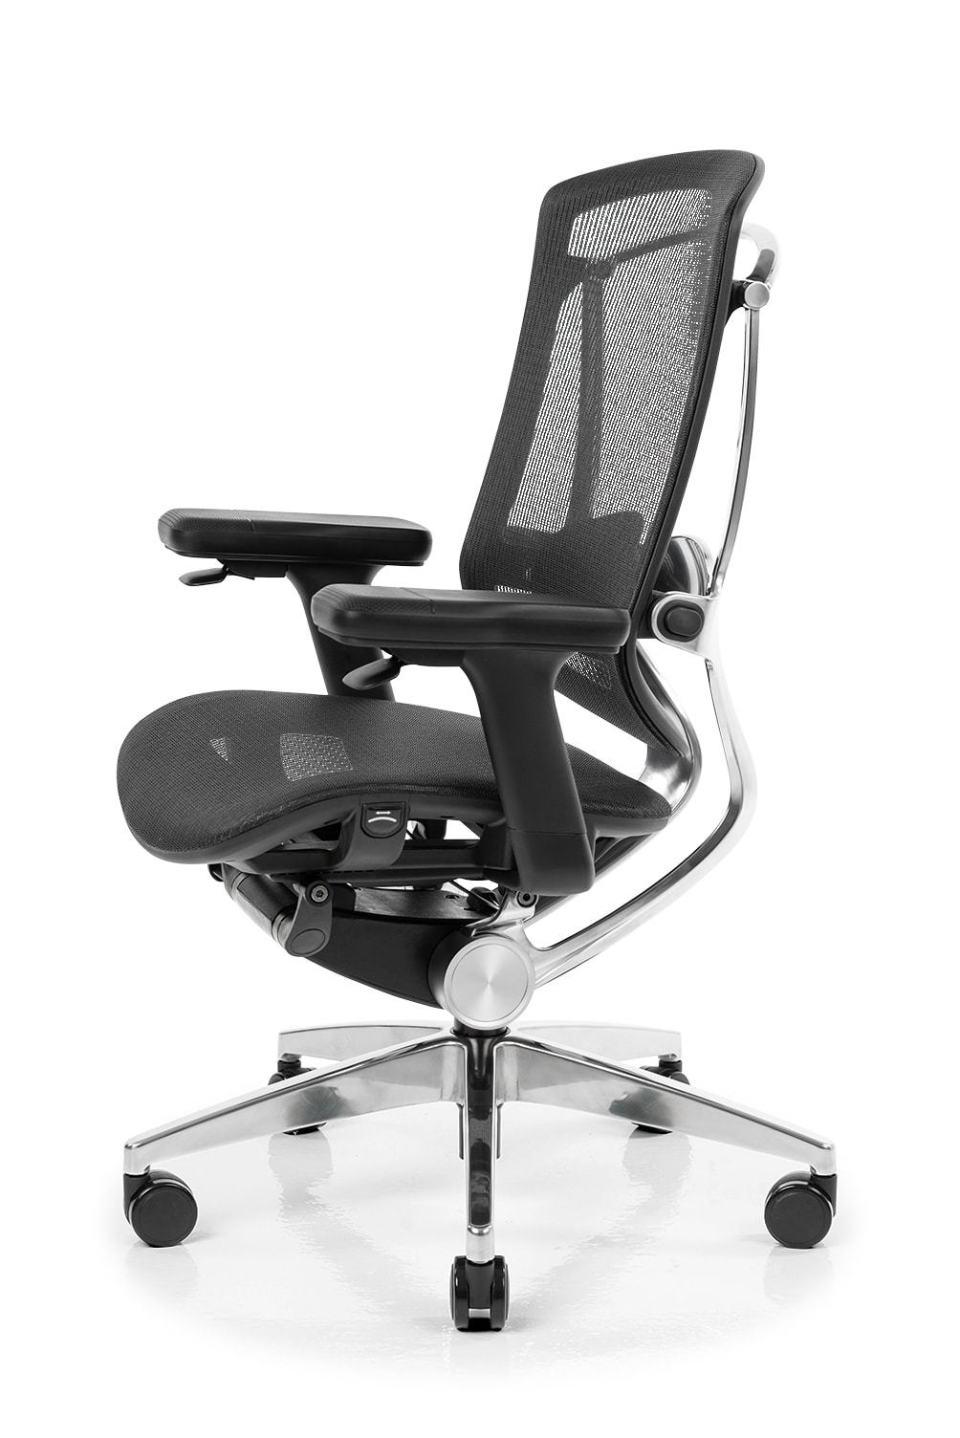 NeueChair™ Best Ergonomic Chairs in Singapore